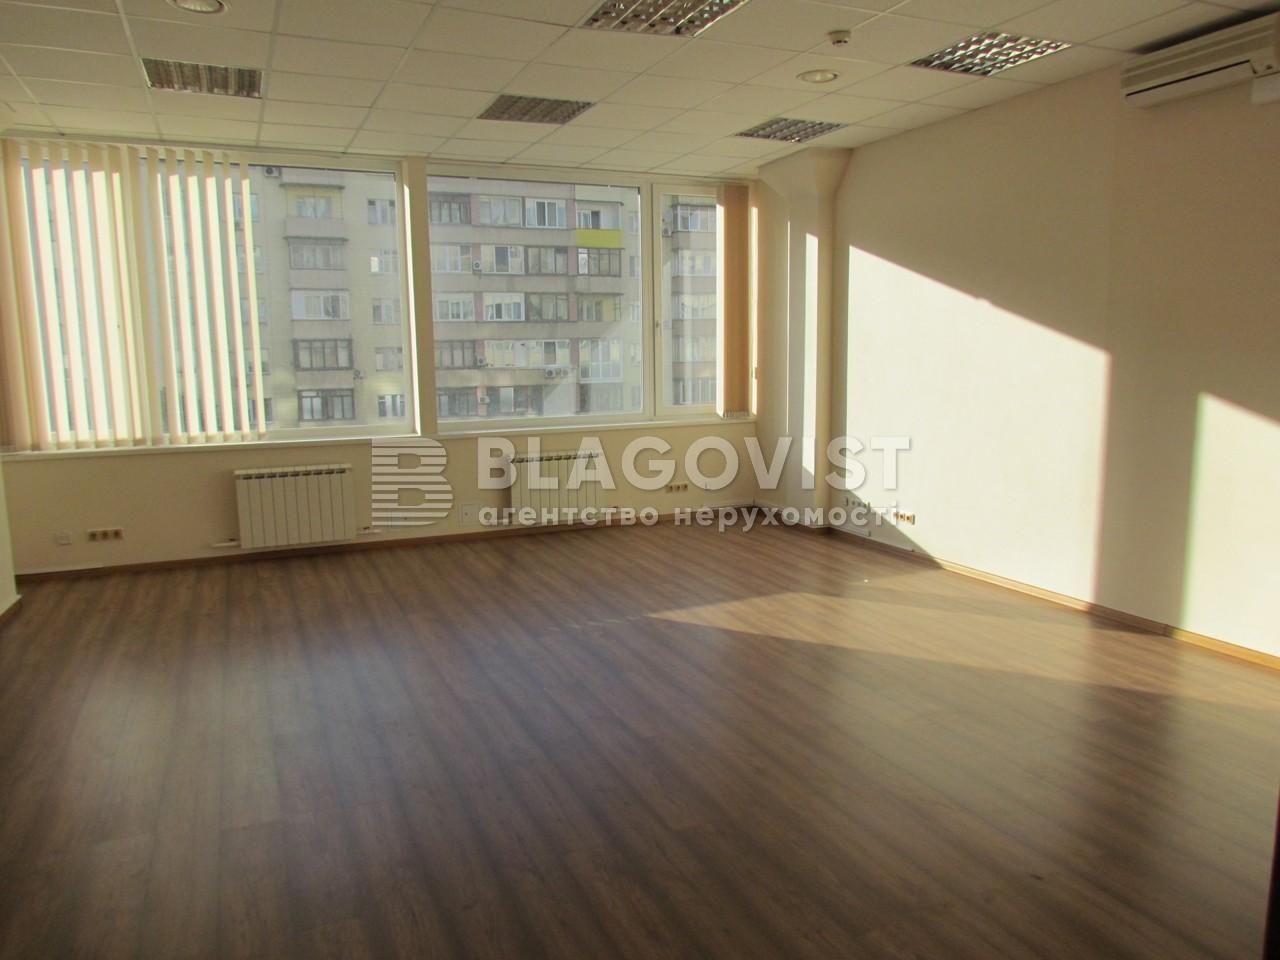 Офис, H-41464, Леси Украинки бульв., Киев - Фото 7